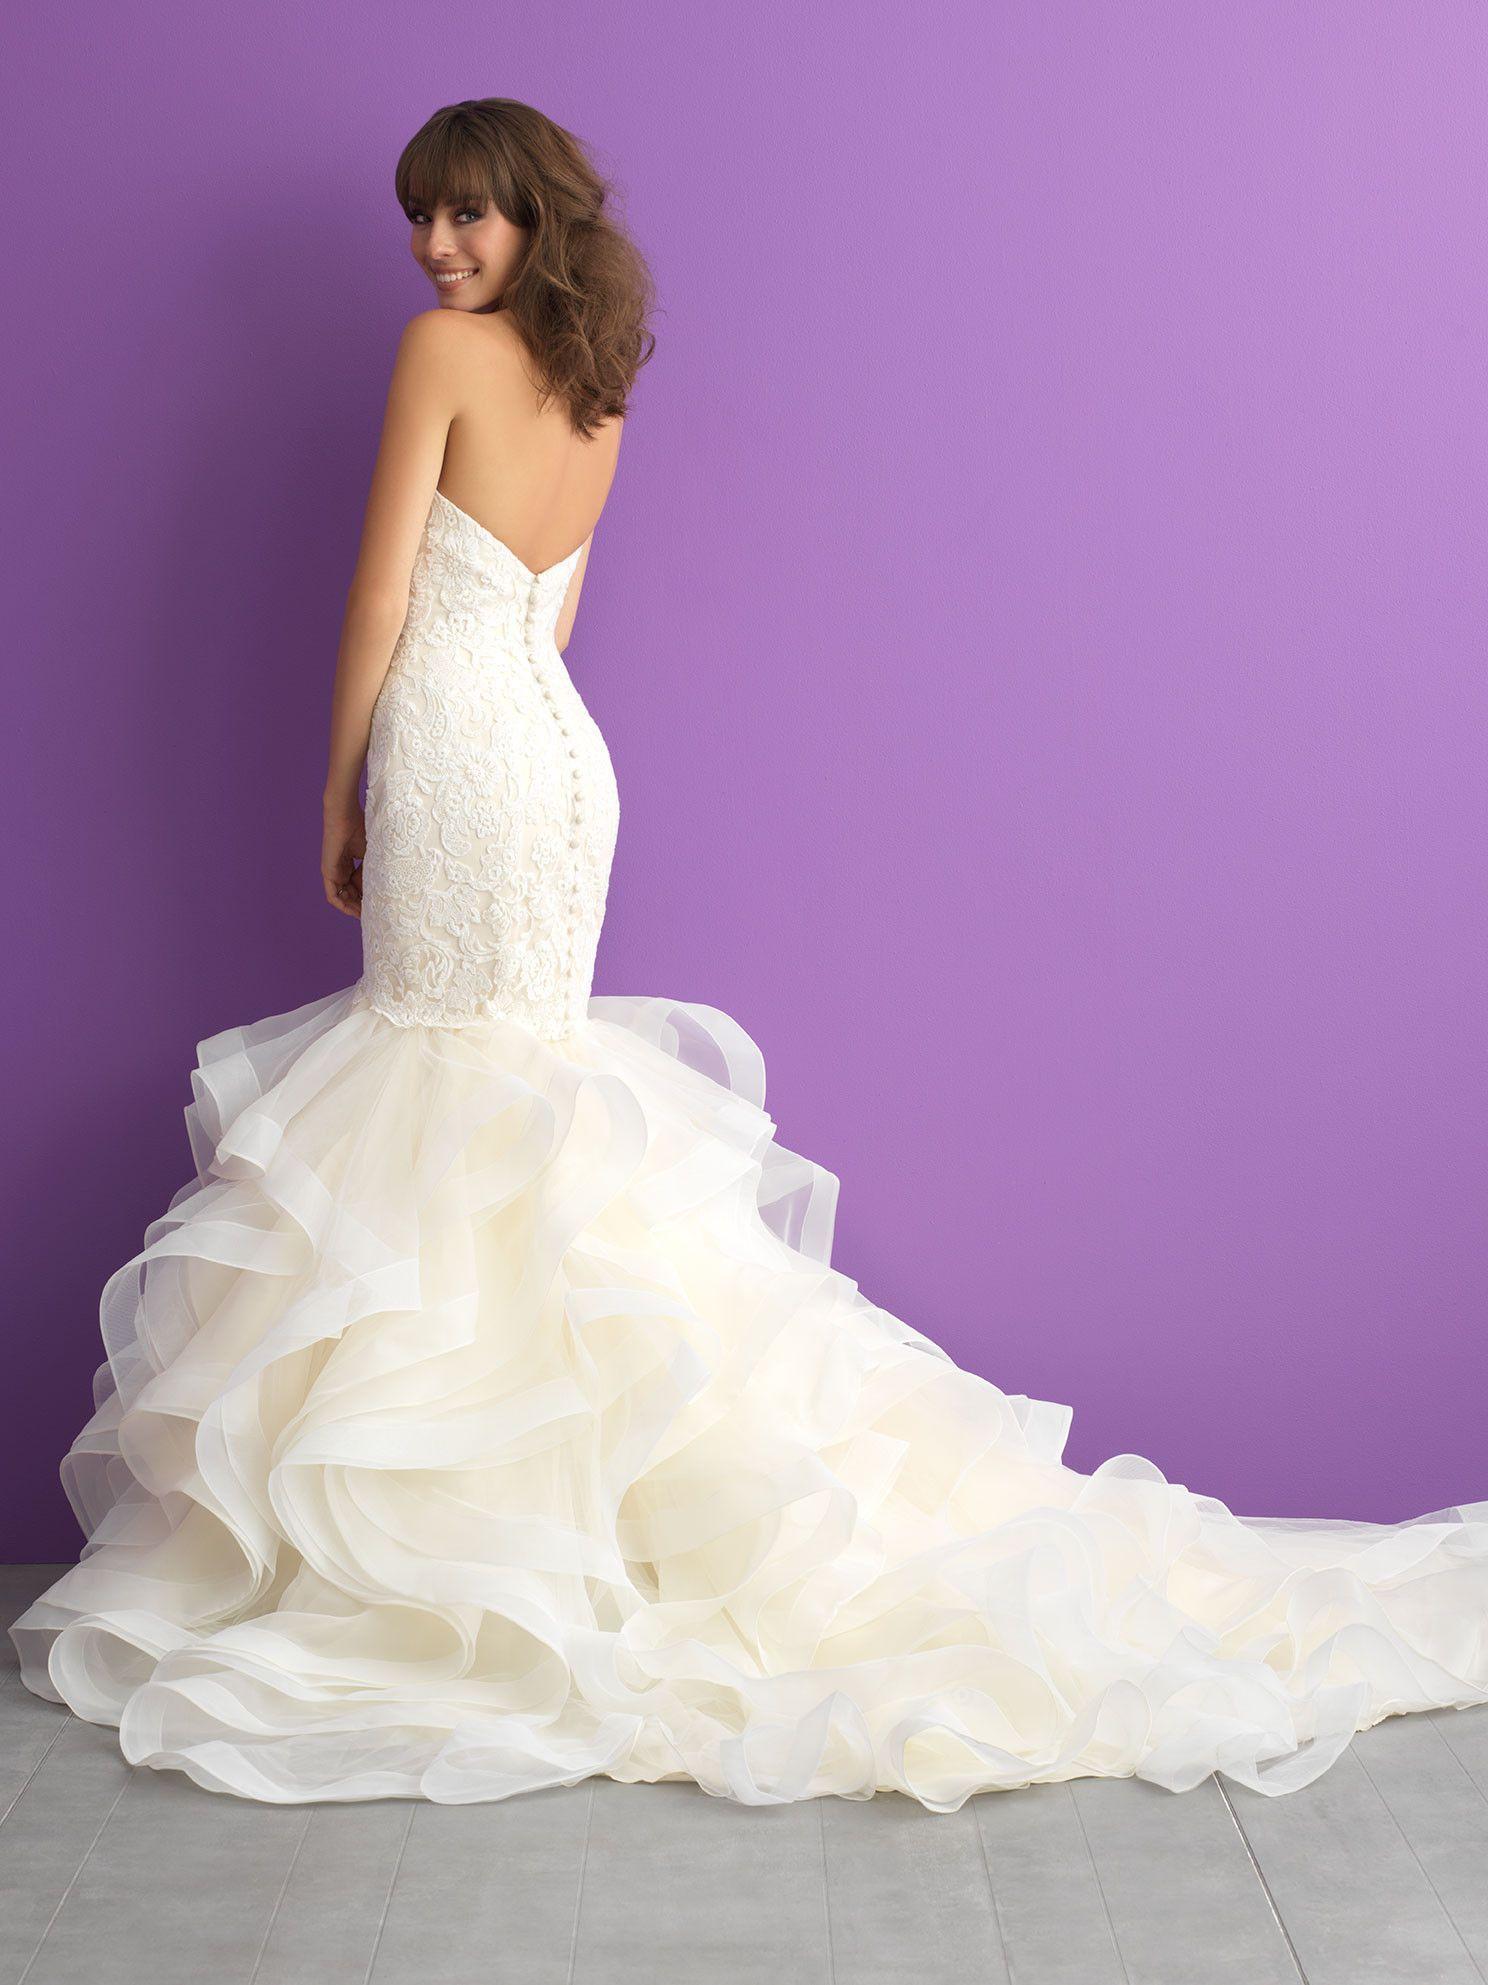 Wedding dresses fresno  Allure  Sample  Products  Pinterest  Wedding dresses Wedding